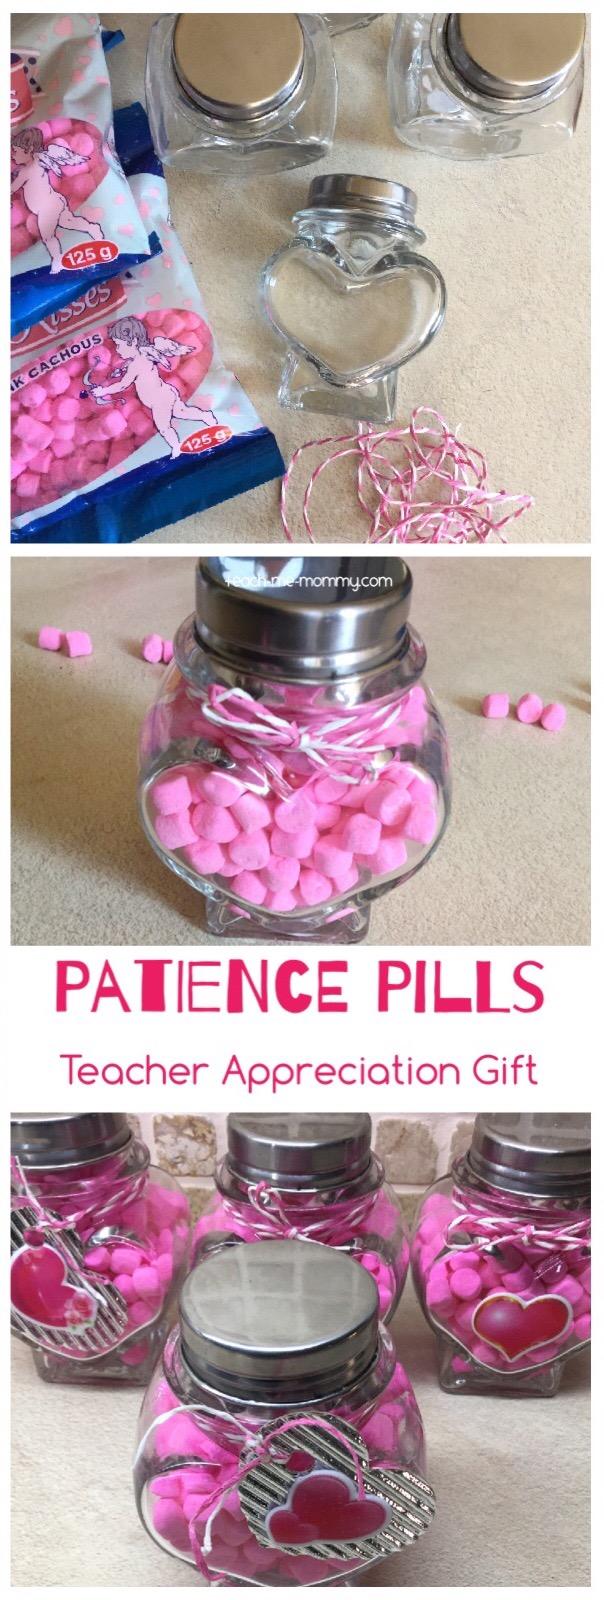 patience pills gift